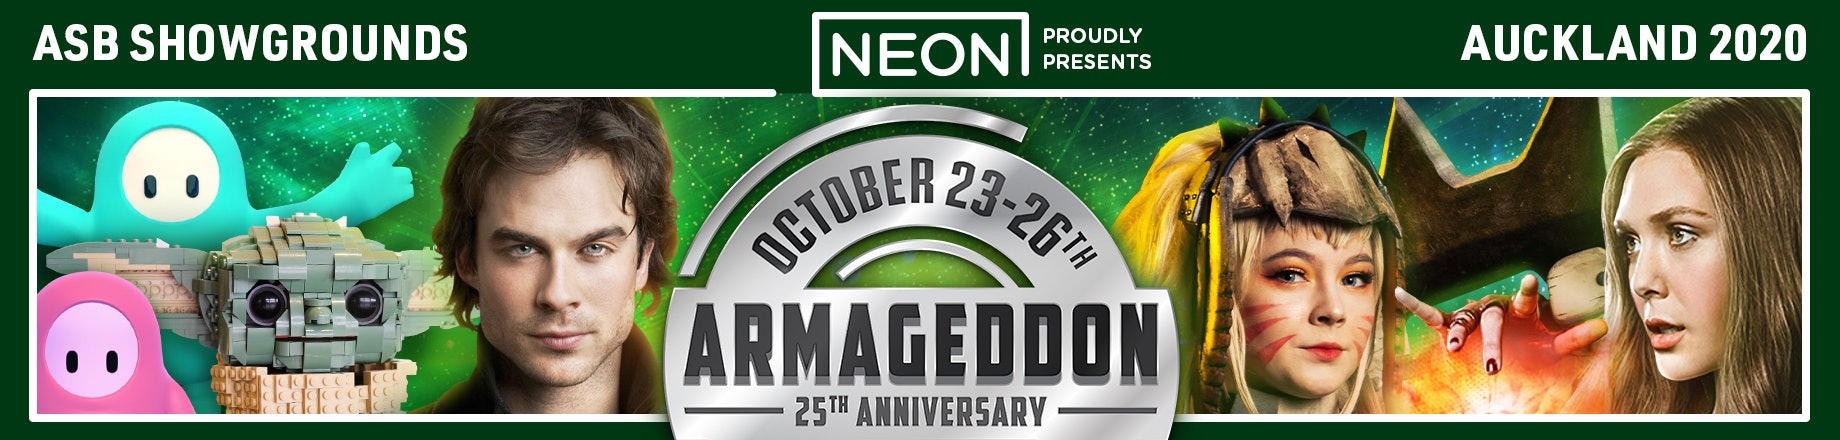 Armageddon Expo 2020 - Official Tickets